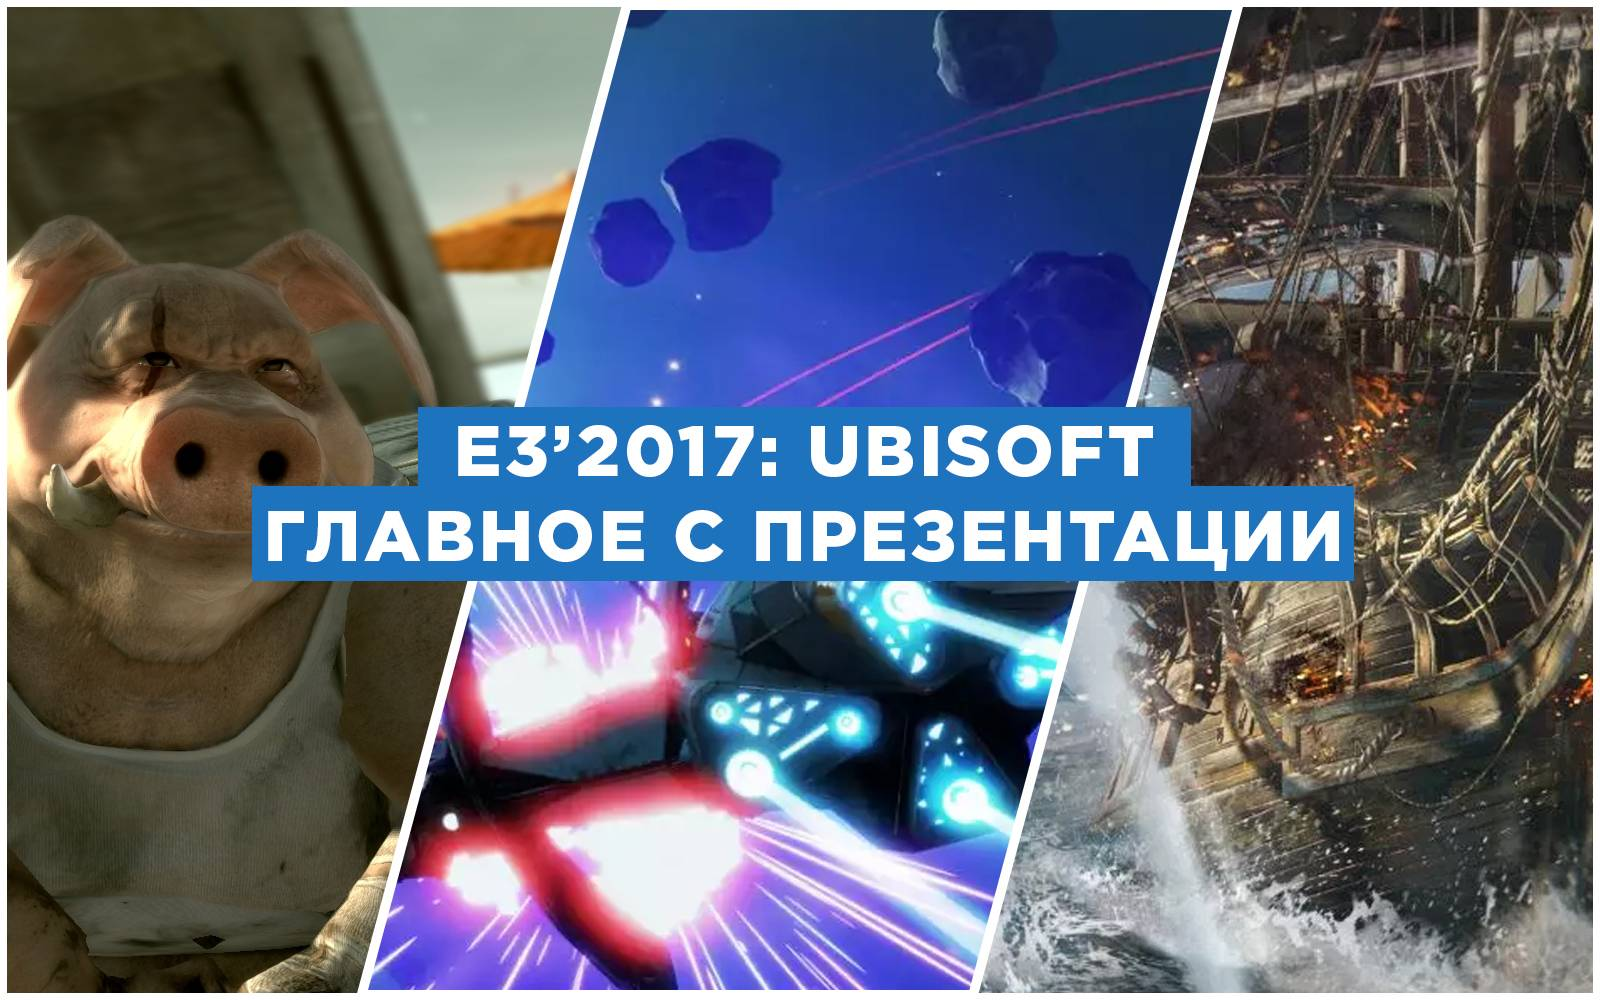 E3 2017: главное с презентации Ubisoft